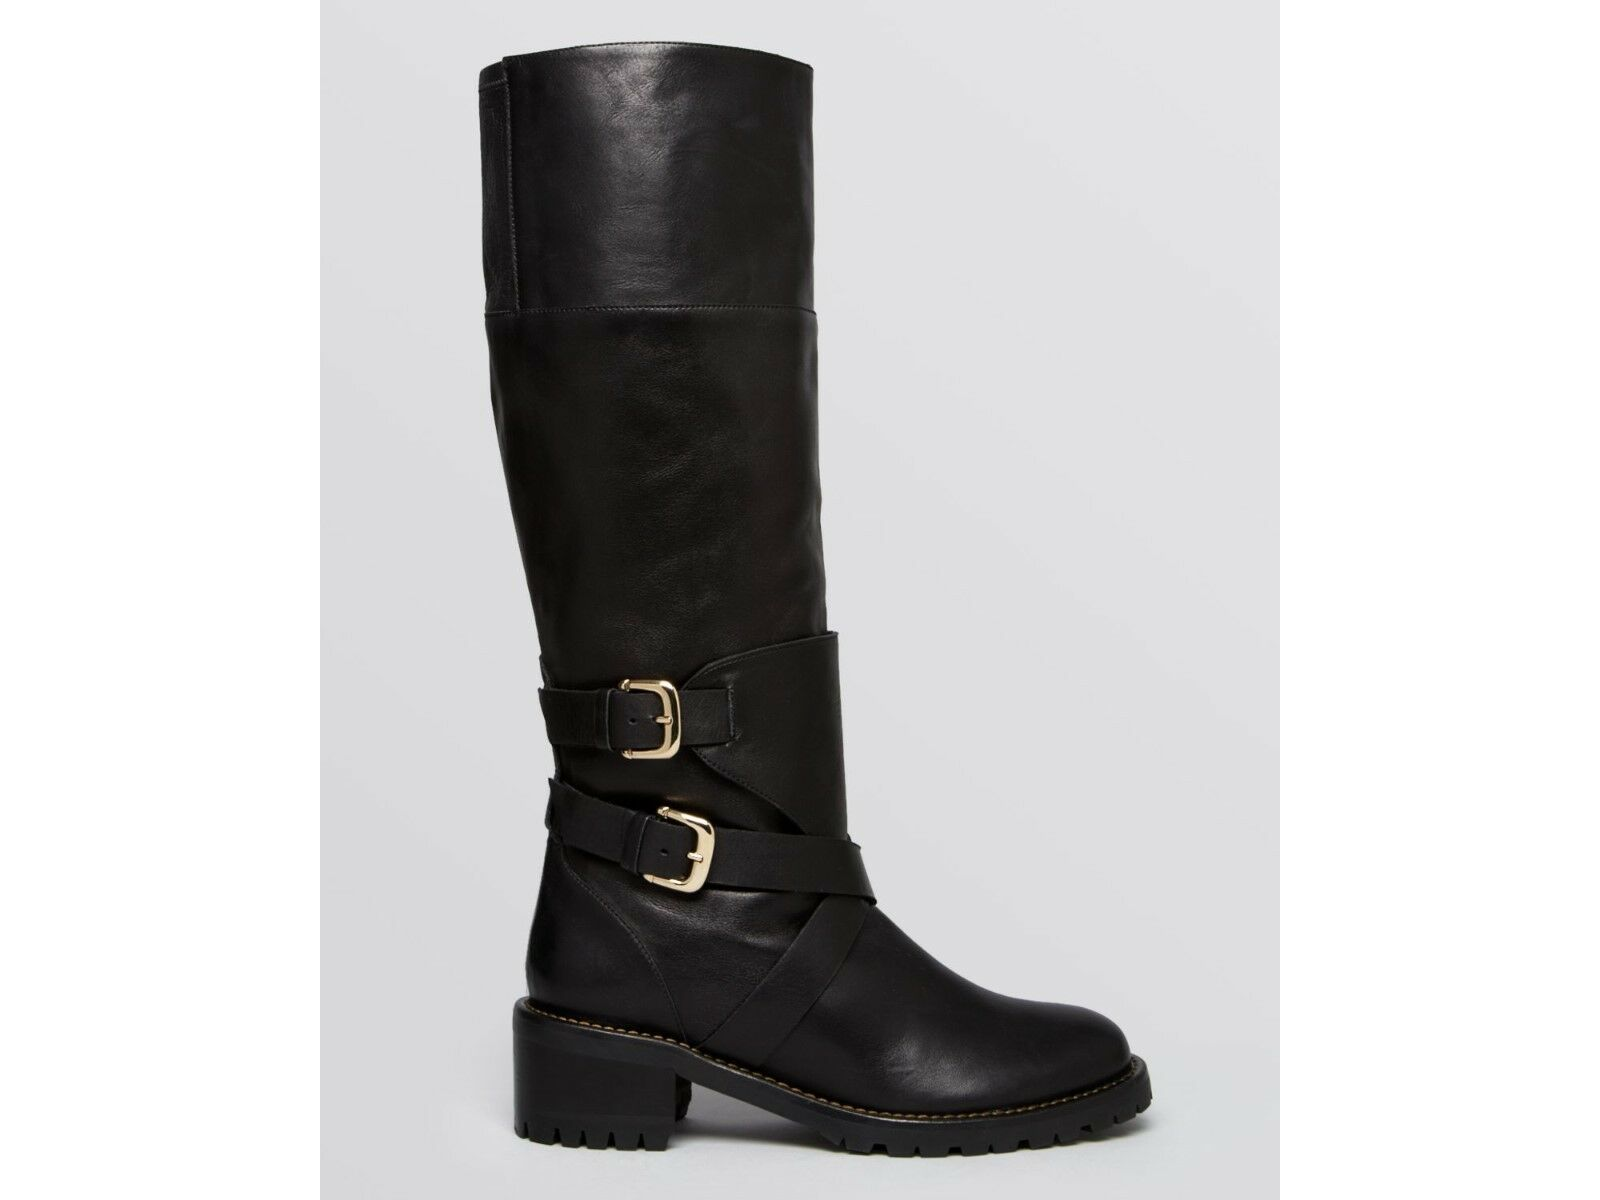 Dana Davis Stiefel Leather Madison Platform Lug Sole Stiefel Madison Leather 39469c